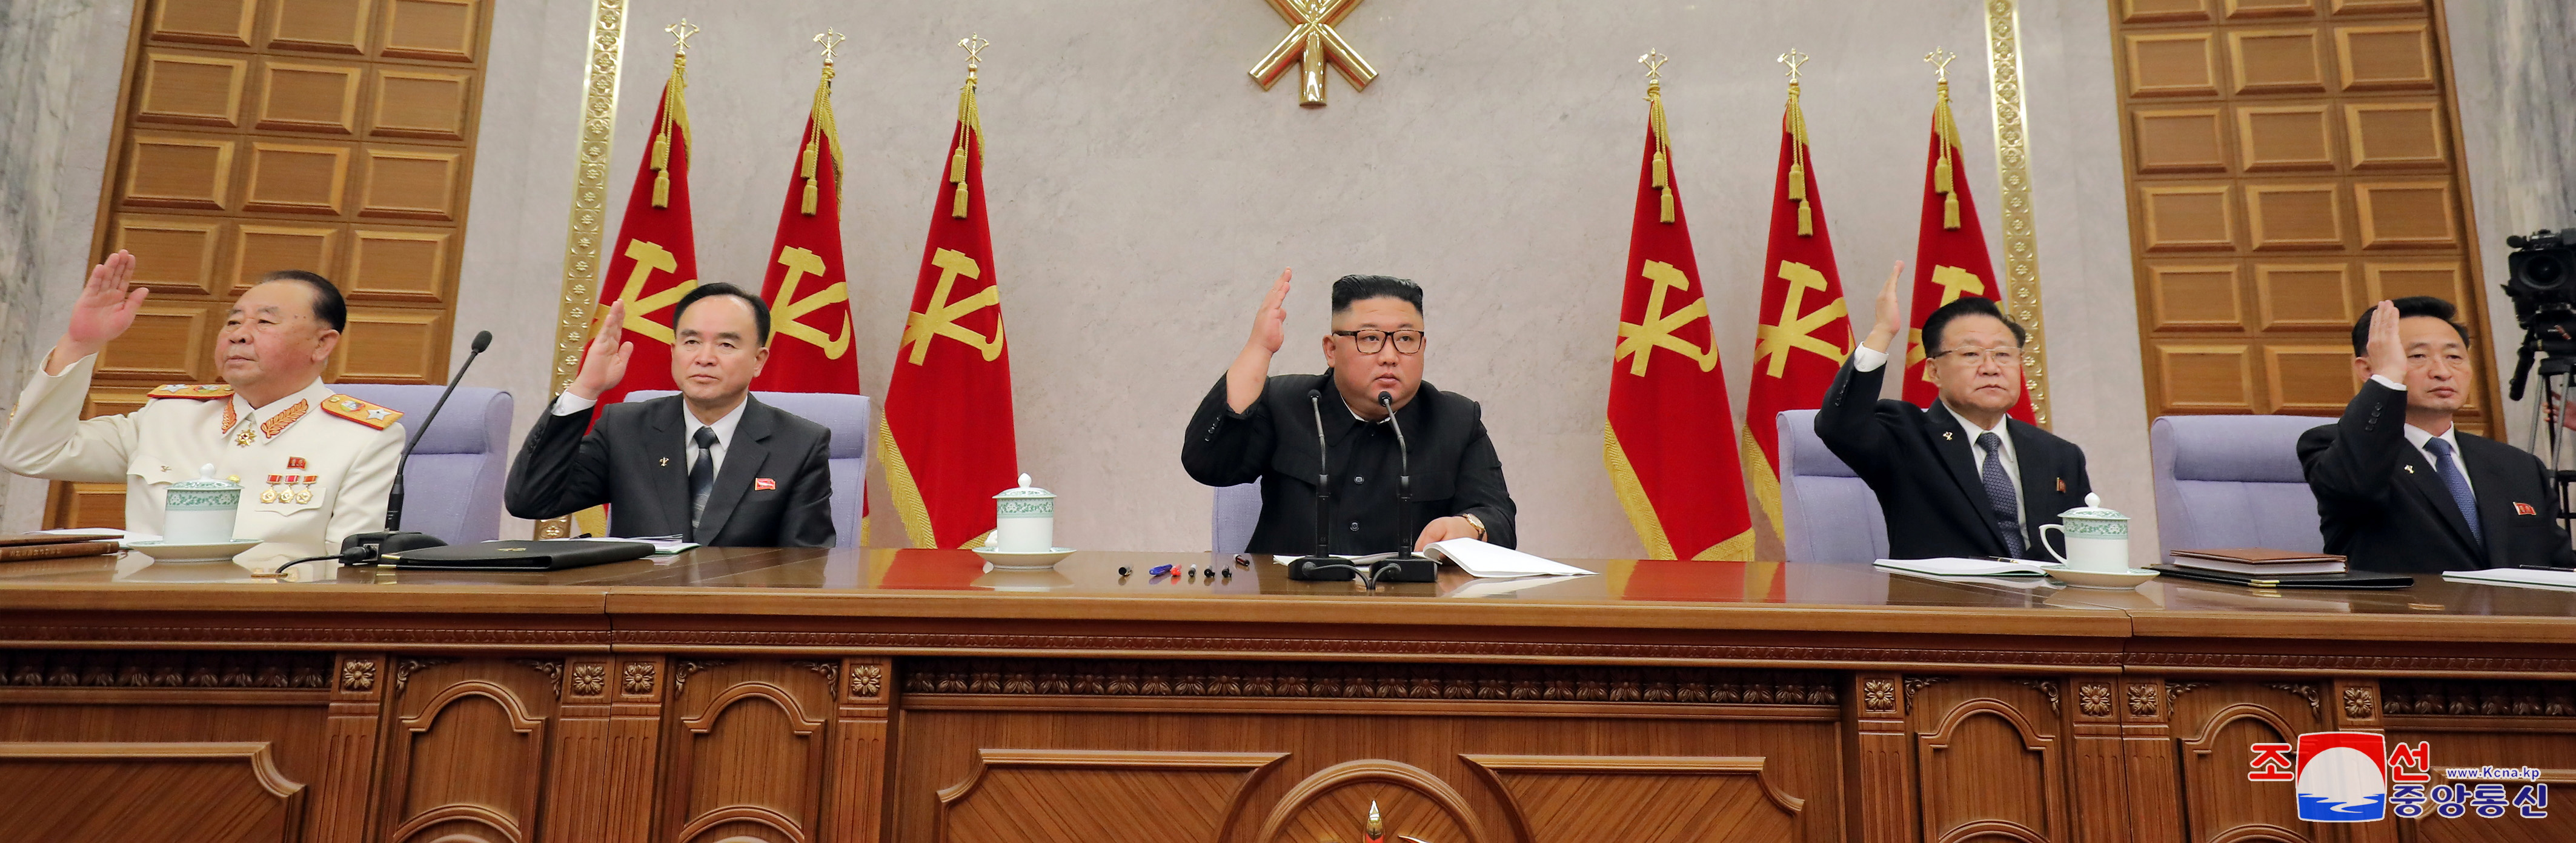 North Korea's economic crisis: Last chance for denuclearization?